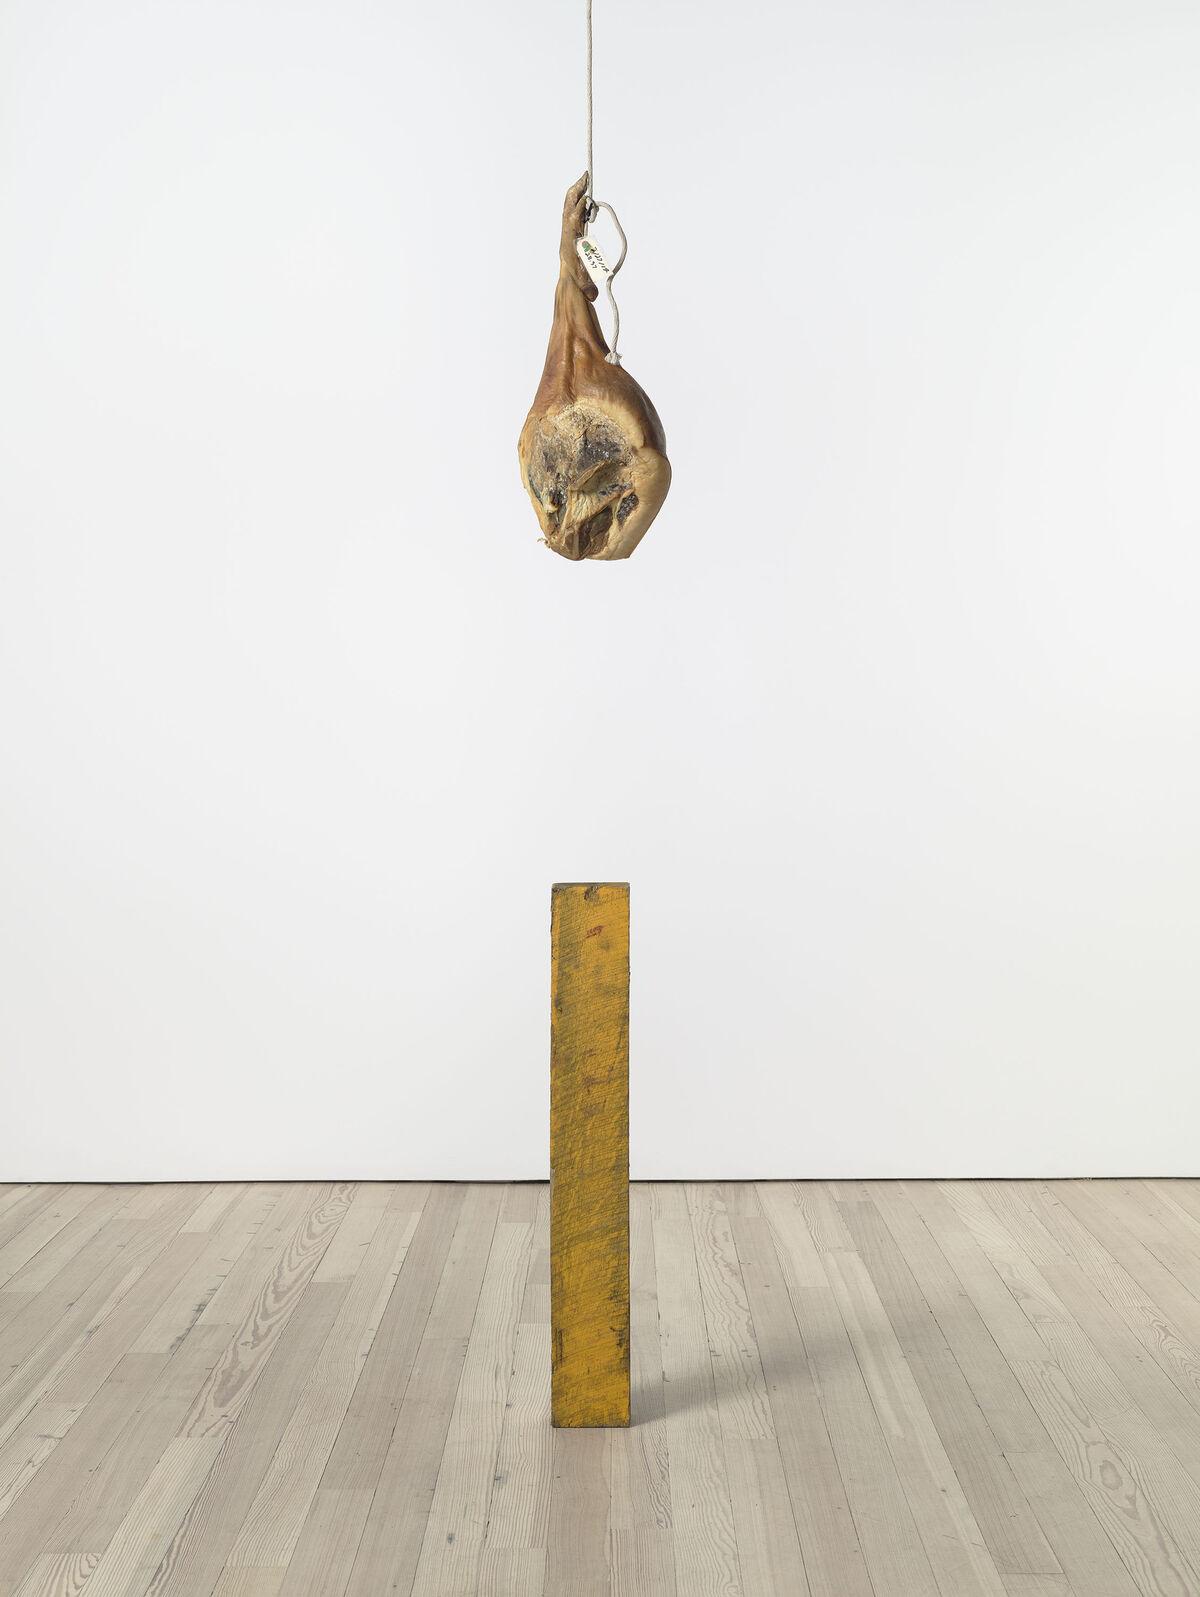 Virginia Overton, Untitled (KO's Ham), 2016, at The Whitney Museum of American Art, New York. Courtesy of the artist and Bortolami, New York.